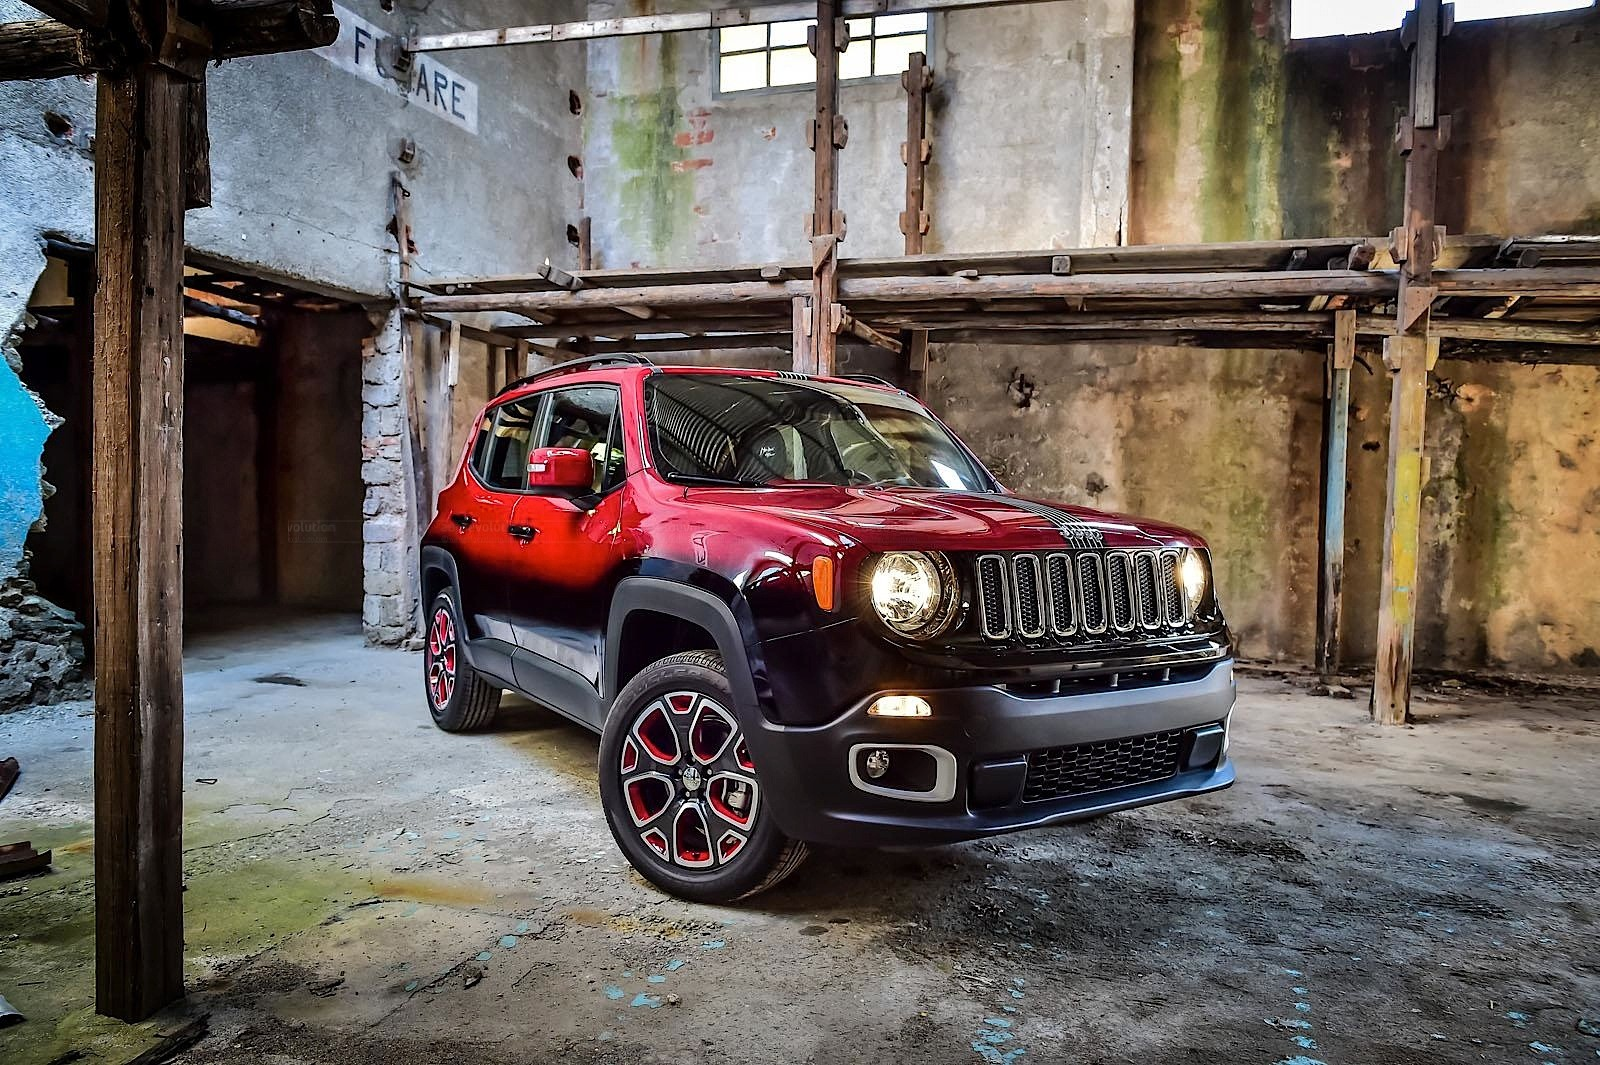 Jeep Renegade Models >> Jeep Renegade Twins Get Custom Paint for Montreux Jazz Festival - autoevolution